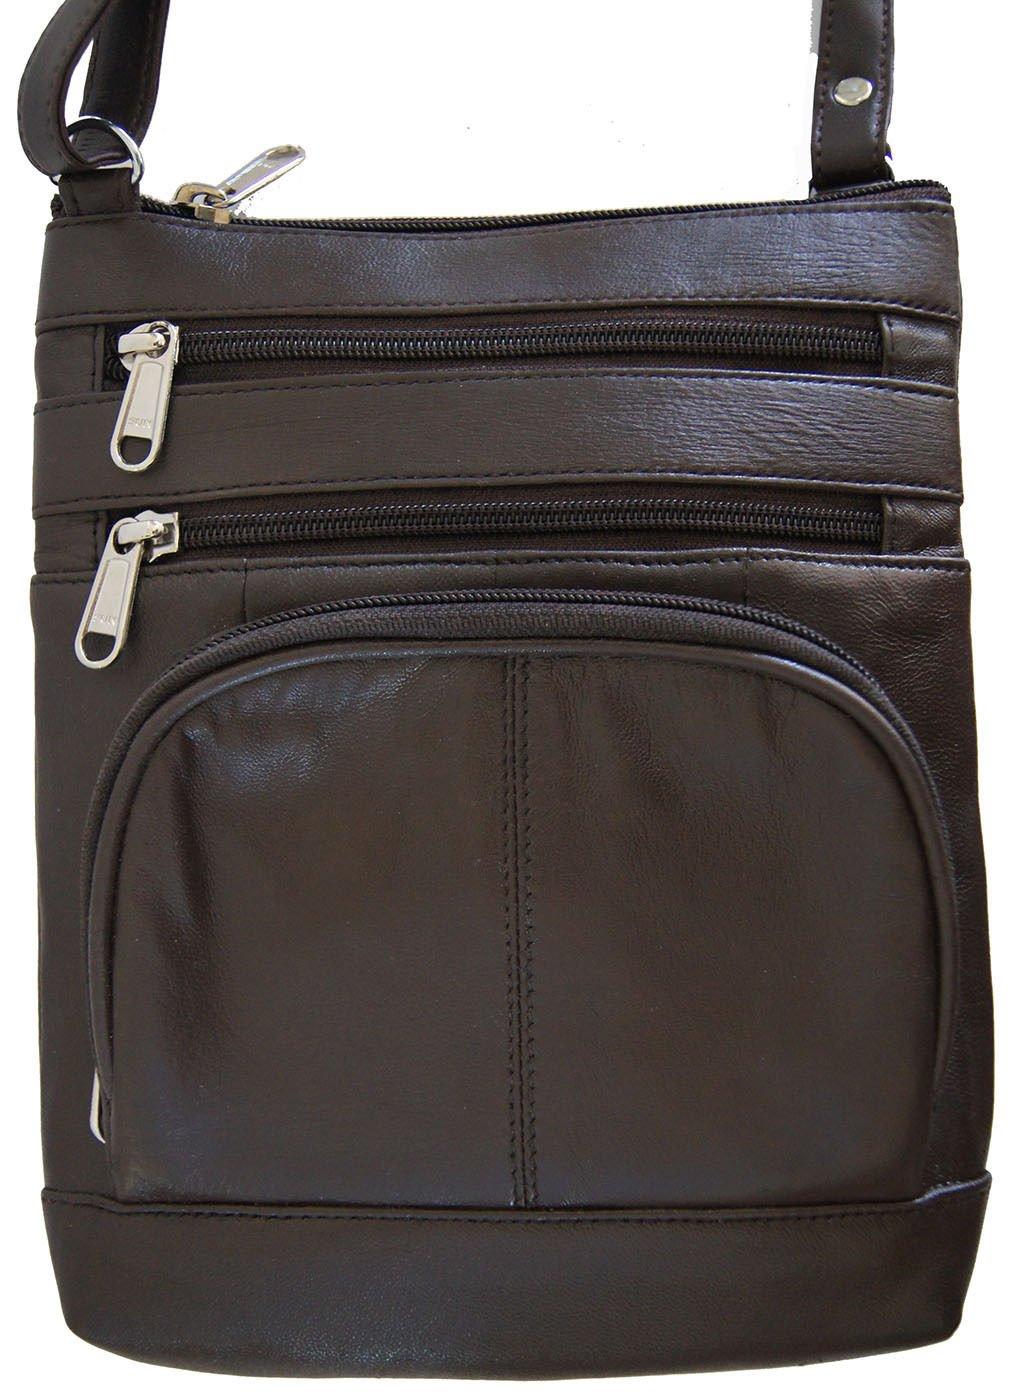 Brown Women And Girls Genuine Leather Cross Body Messenger Handbag, Purse